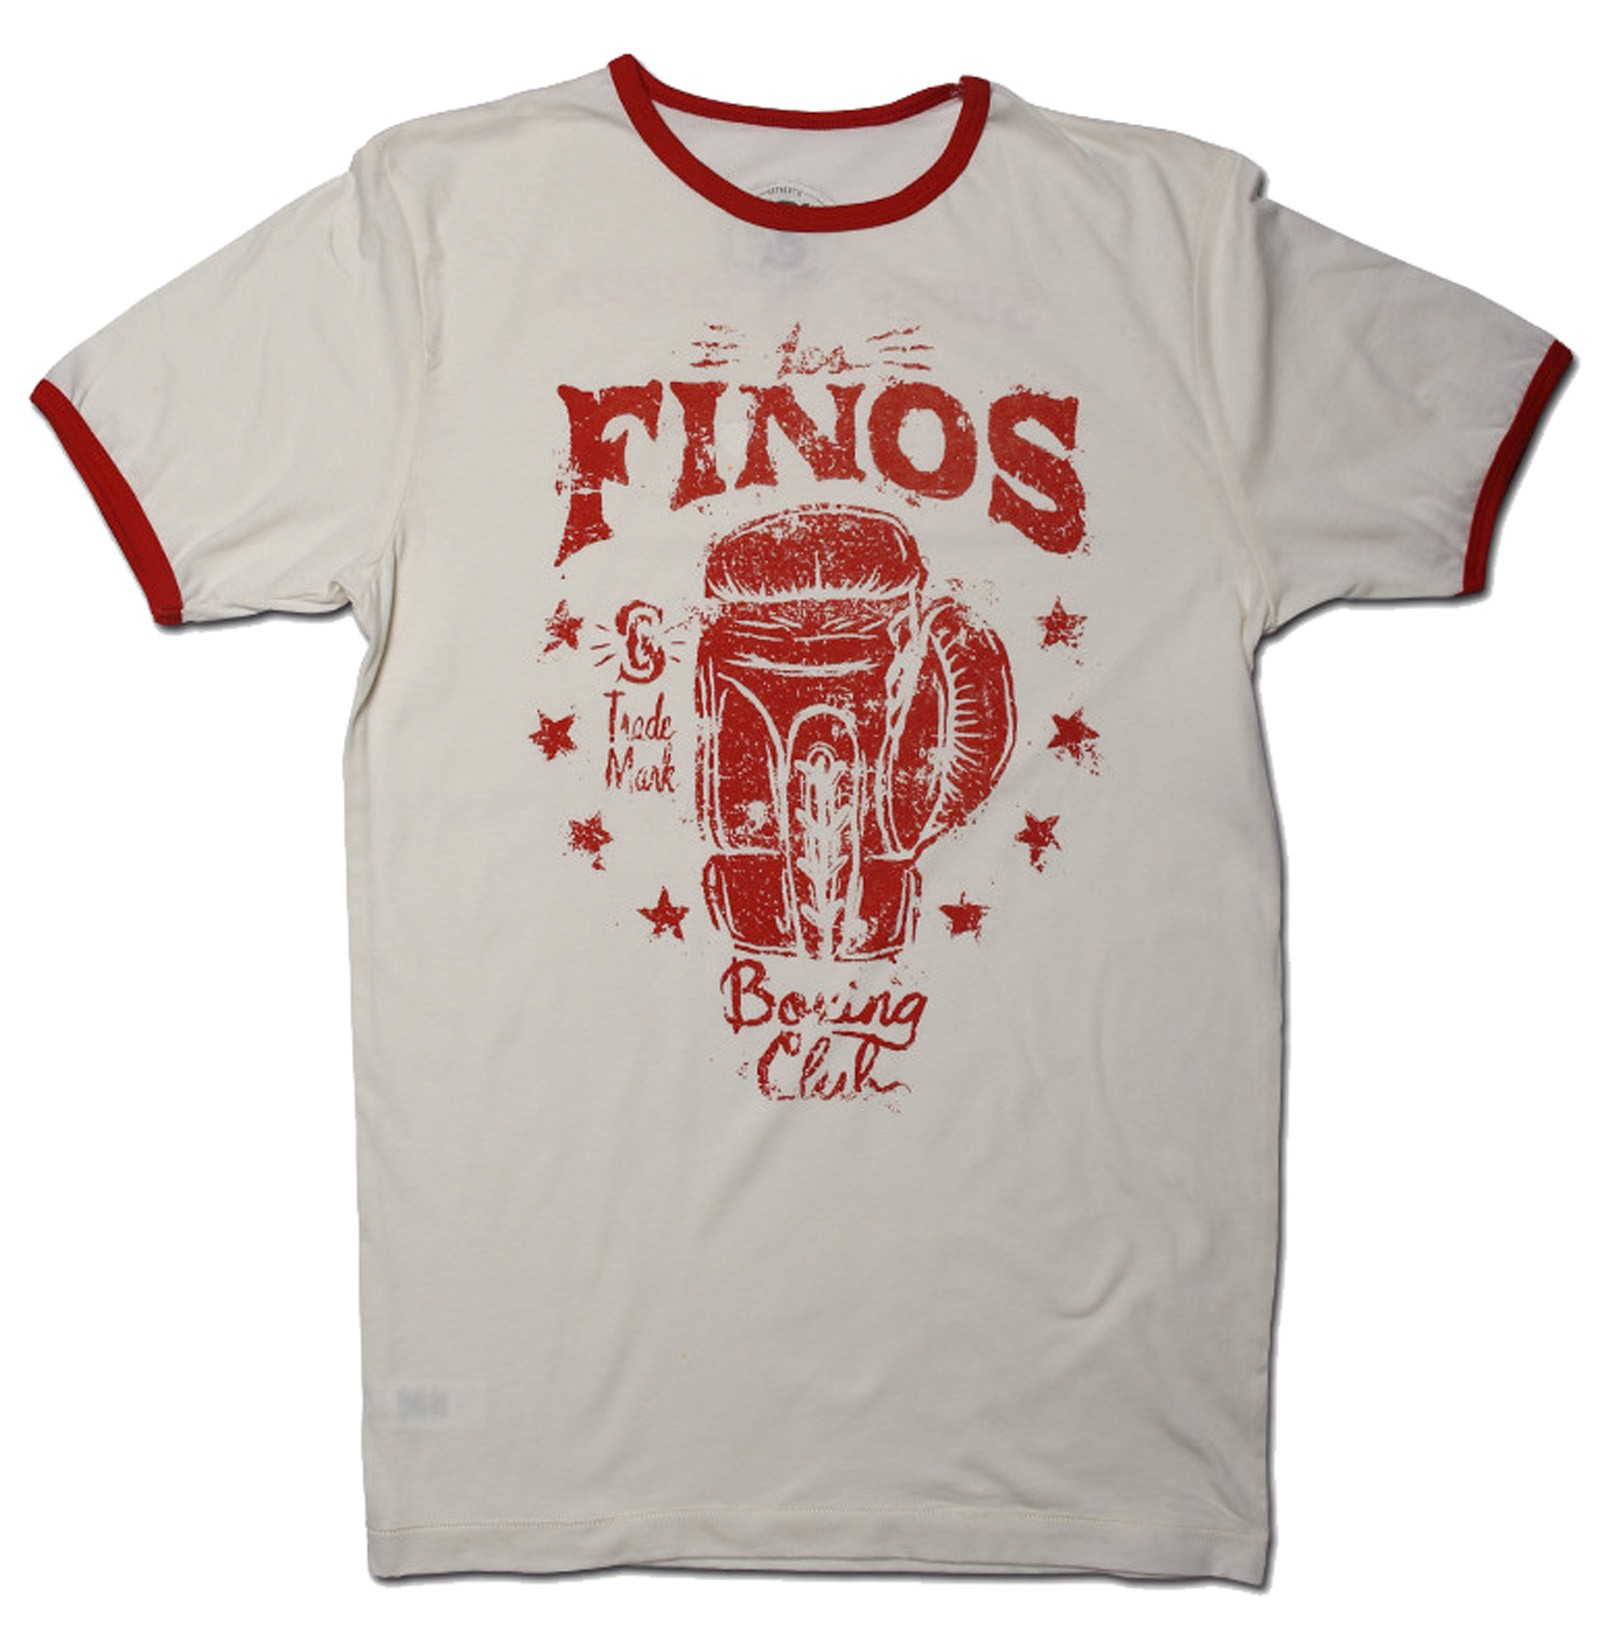 Supercobra Clothing Company - Los Finos Ringer T-Shirt Front